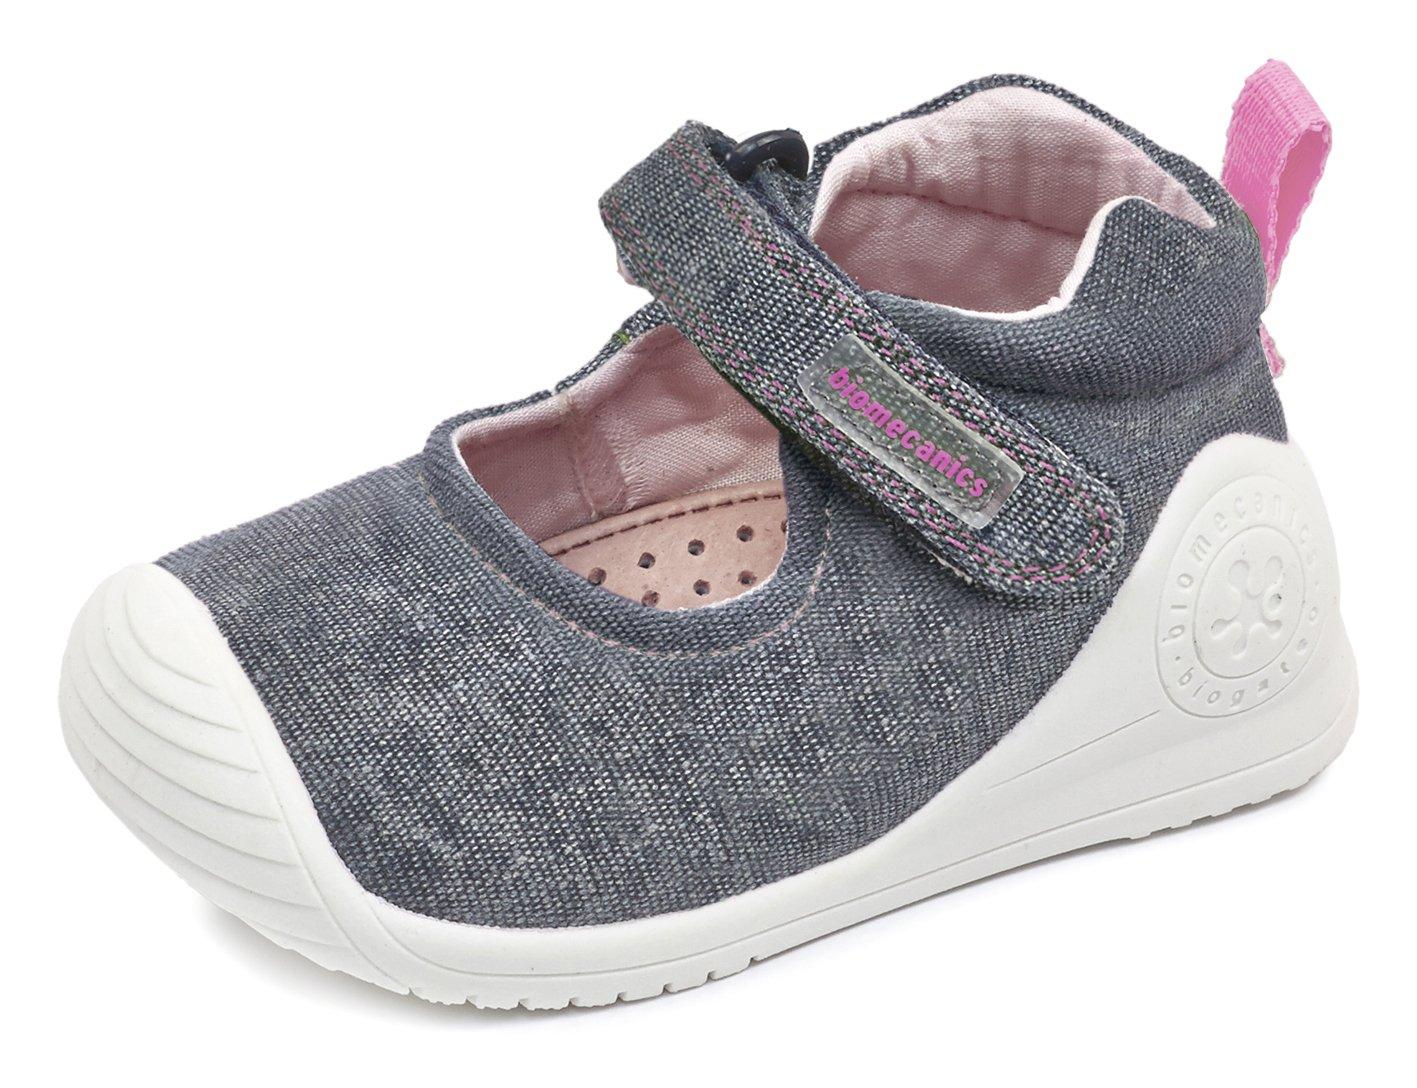 Biomecanics 172155, Zapatillas para Niñas